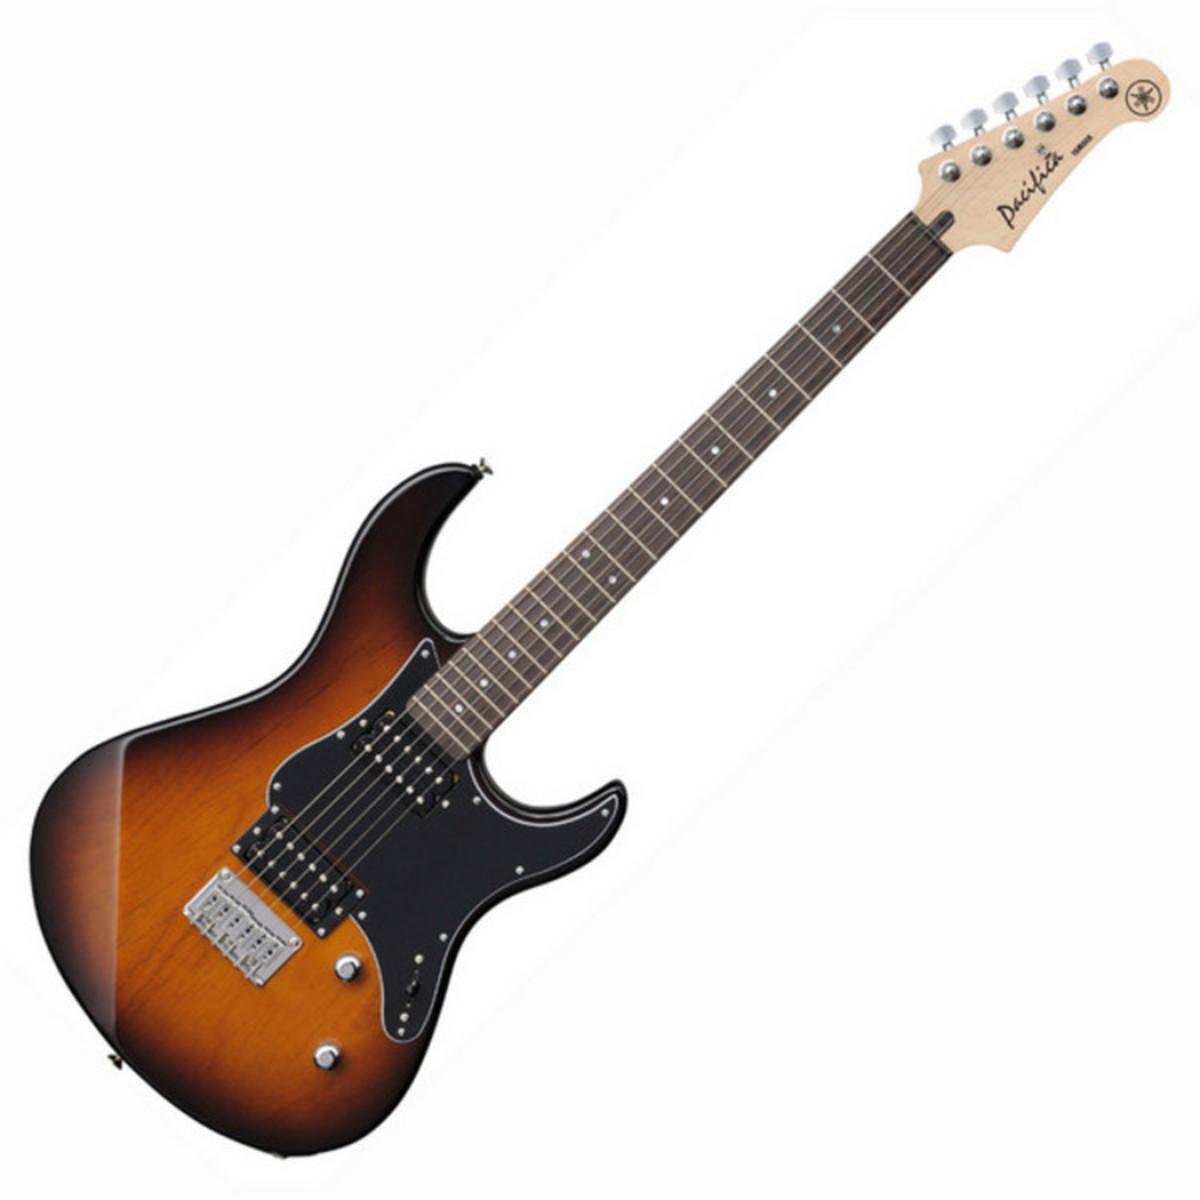 yamaha pacifica 120h electric guitar tobacco sunburst at. Black Bedroom Furniture Sets. Home Design Ideas